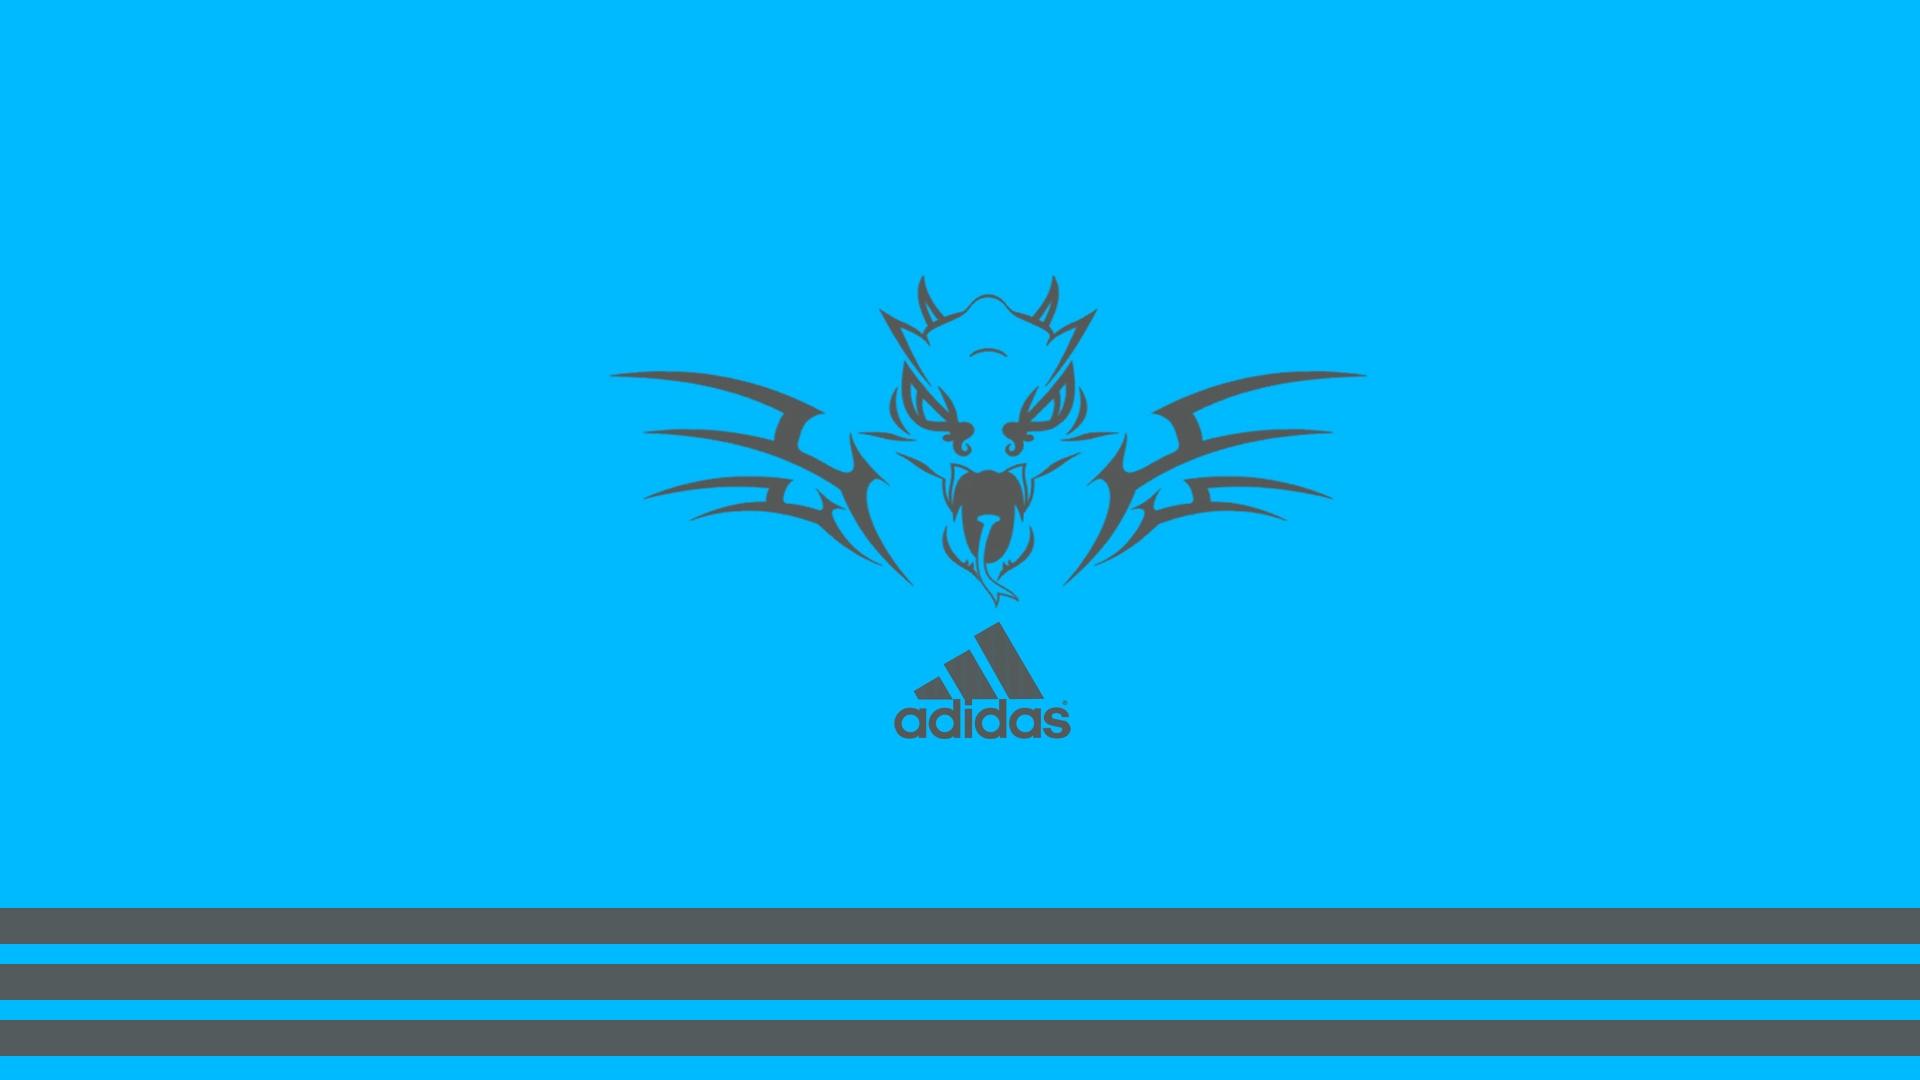 ... Adidas Logo Wallpaper HD-5 ...